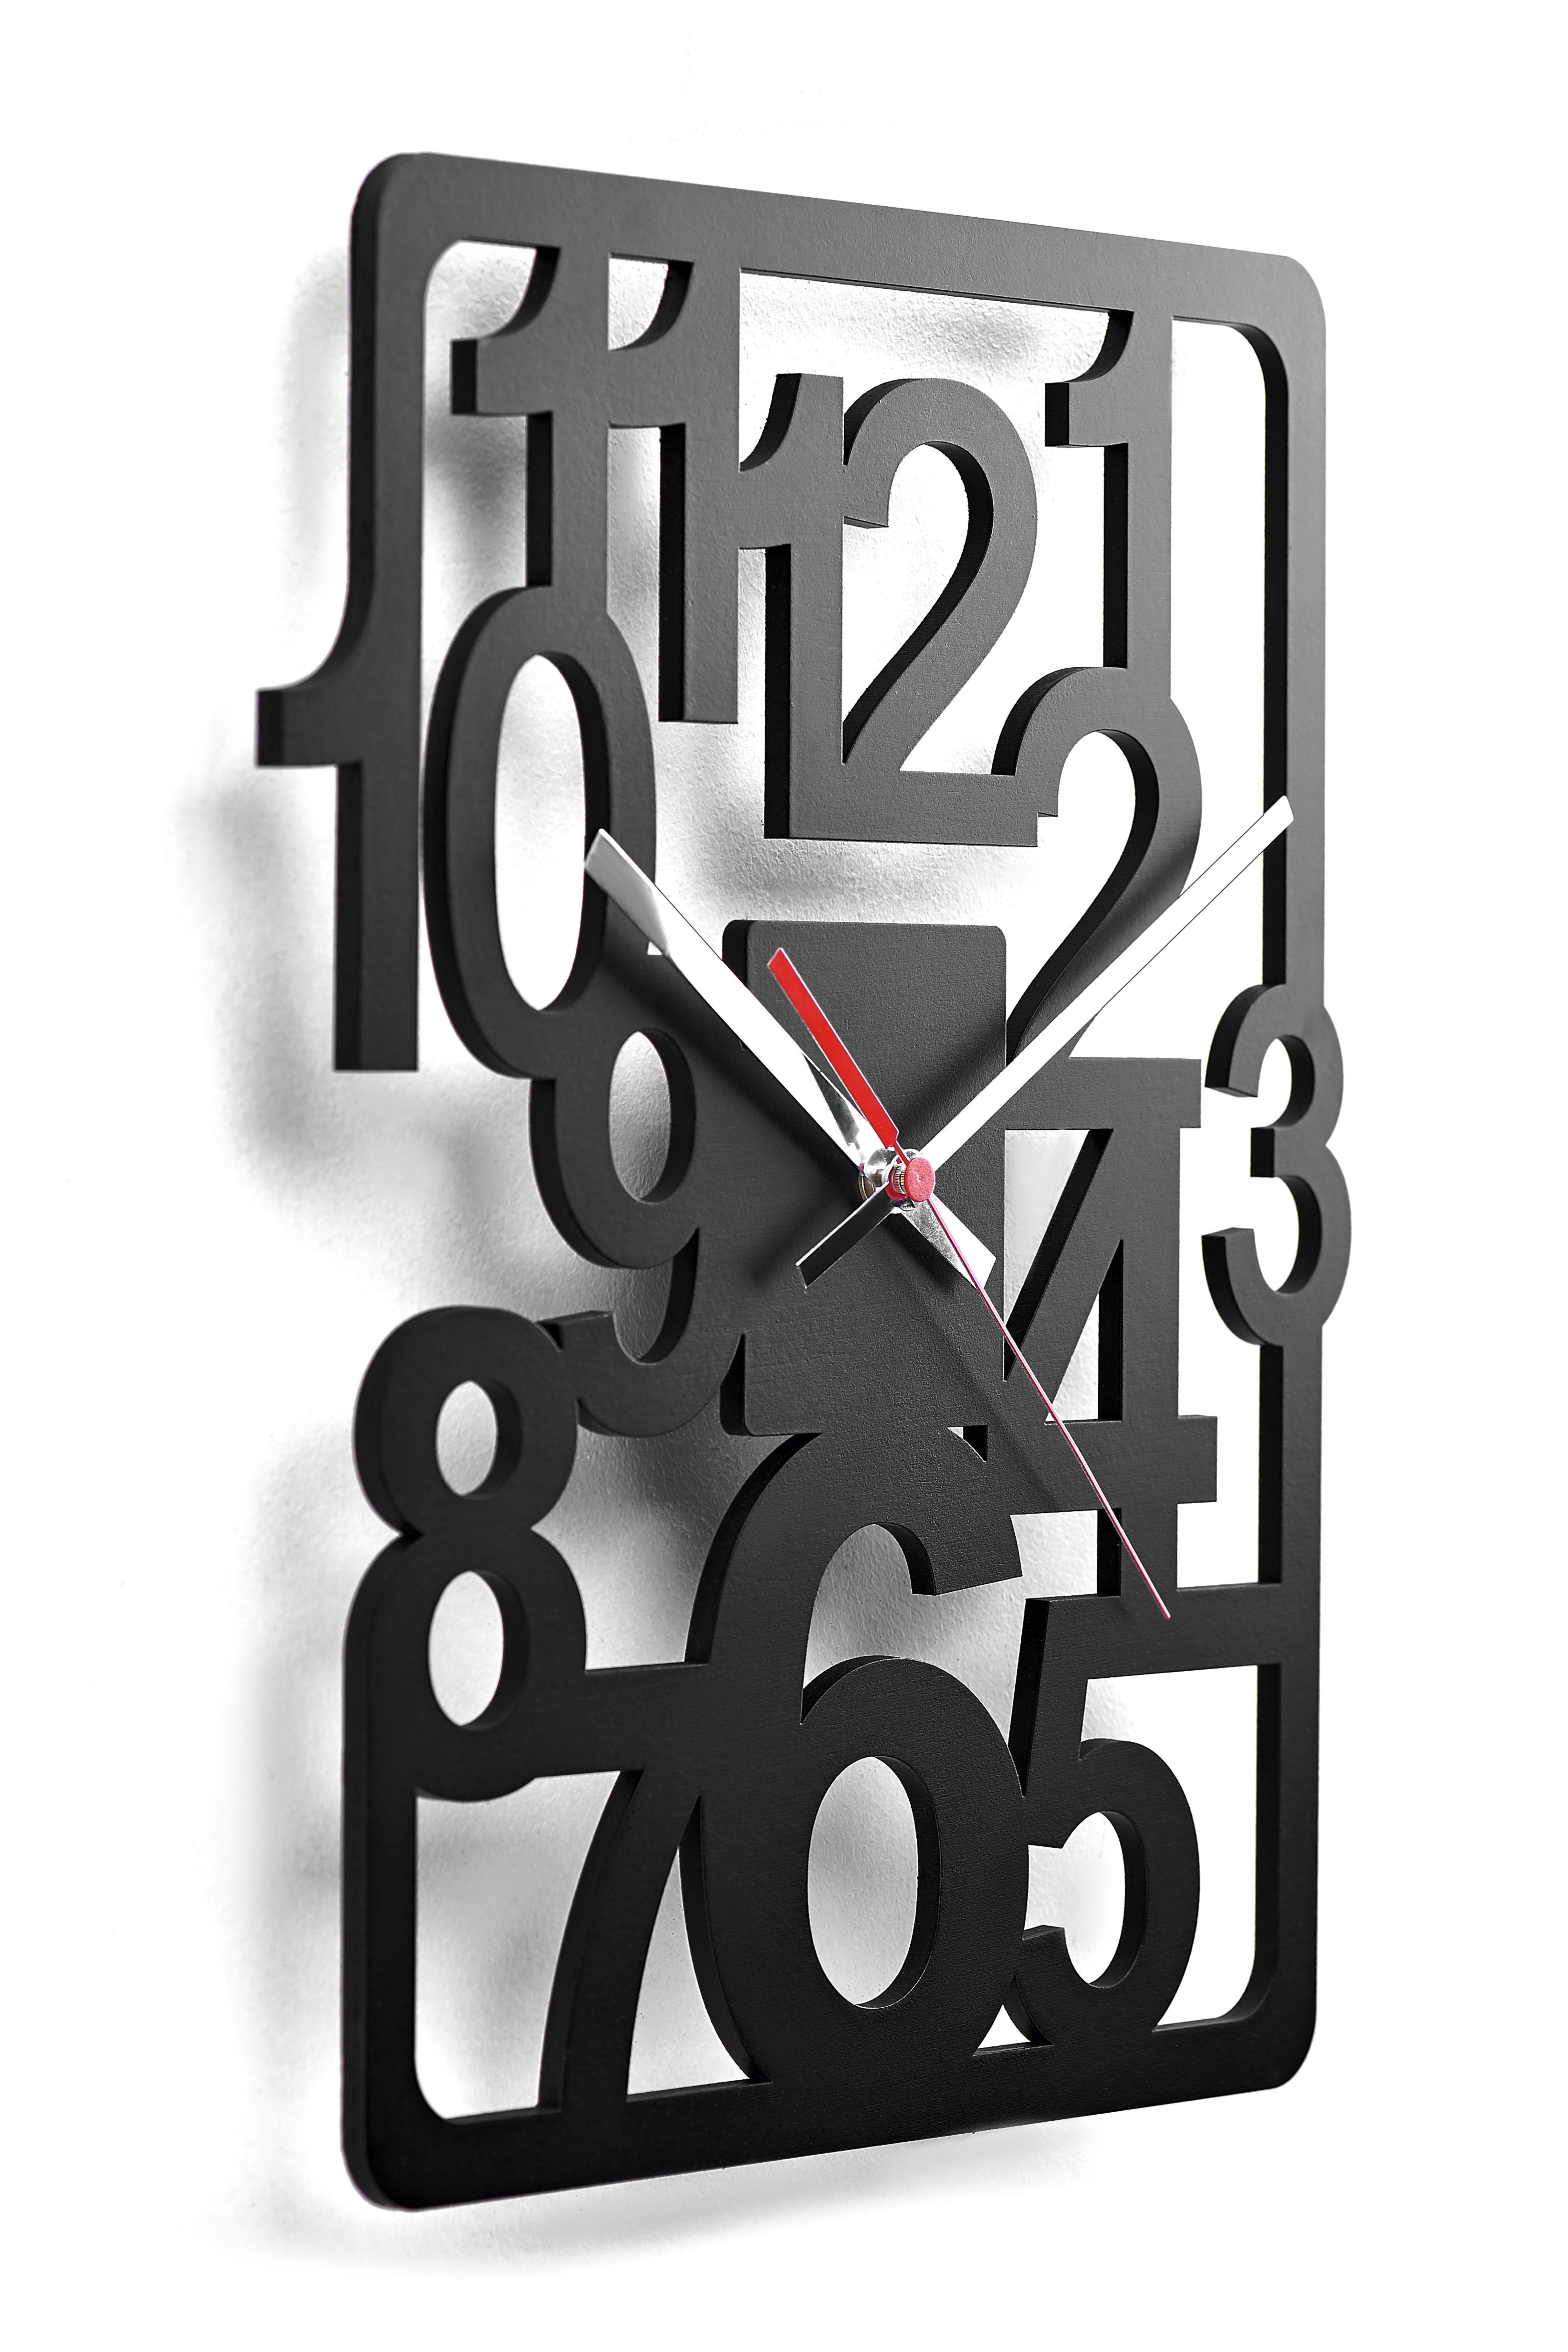 Clock Decor Office Unique Wall Wood Measures 14 96 X14 96 19 7 1496x1496 Clock Decor M In 2020 Wood Wall Clock Unique Office Decor Unique Wall Clocks